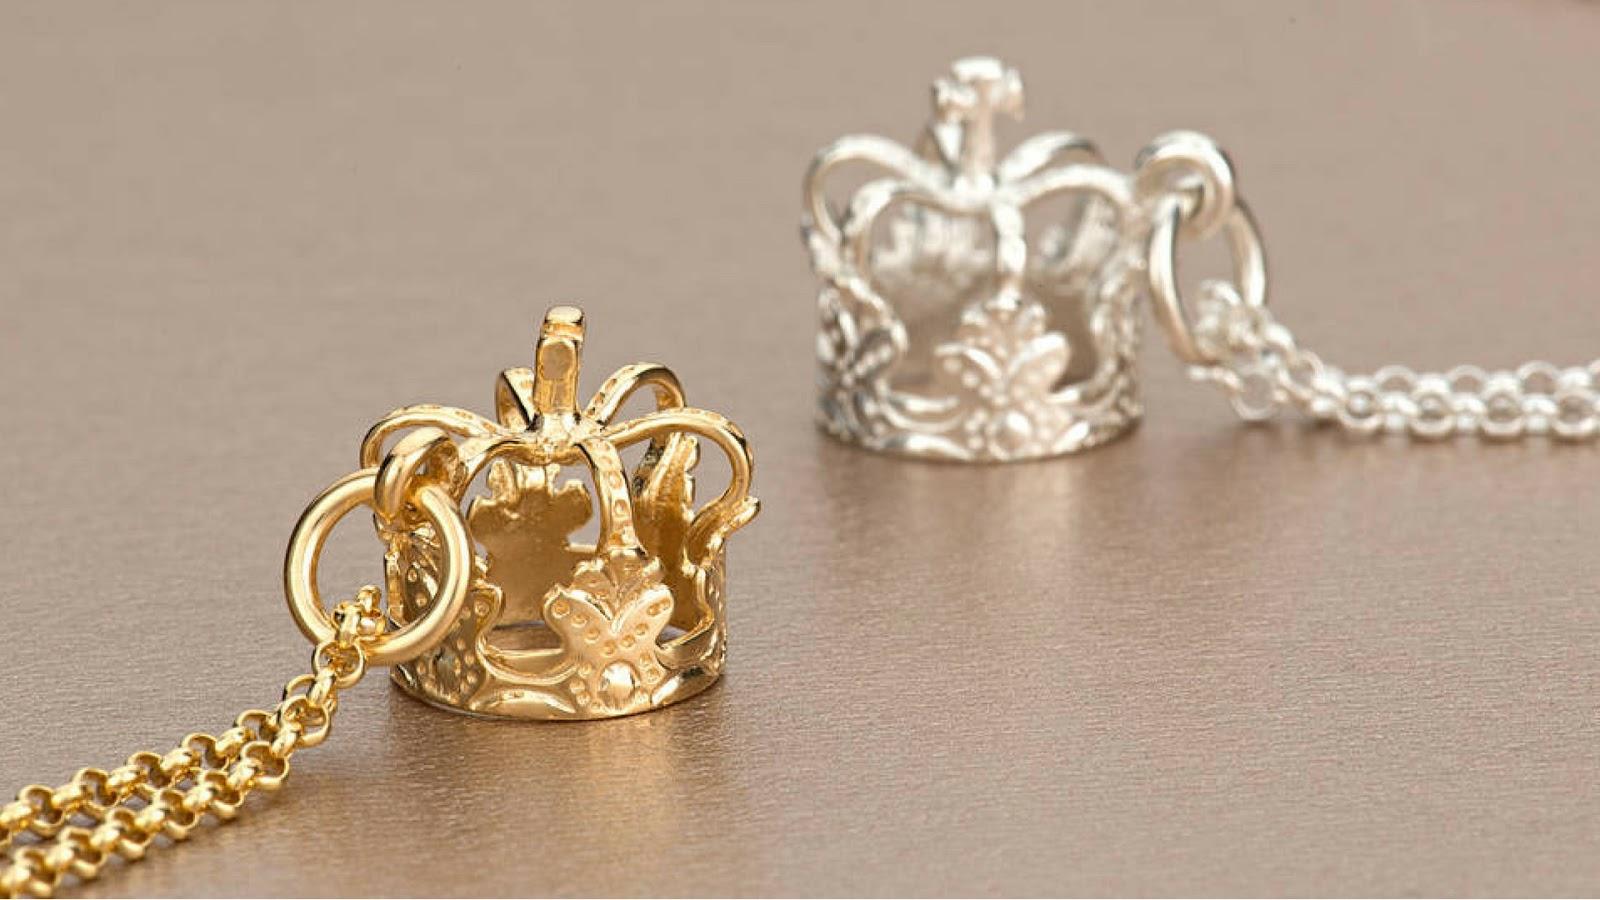 majestuosa corona de pandora